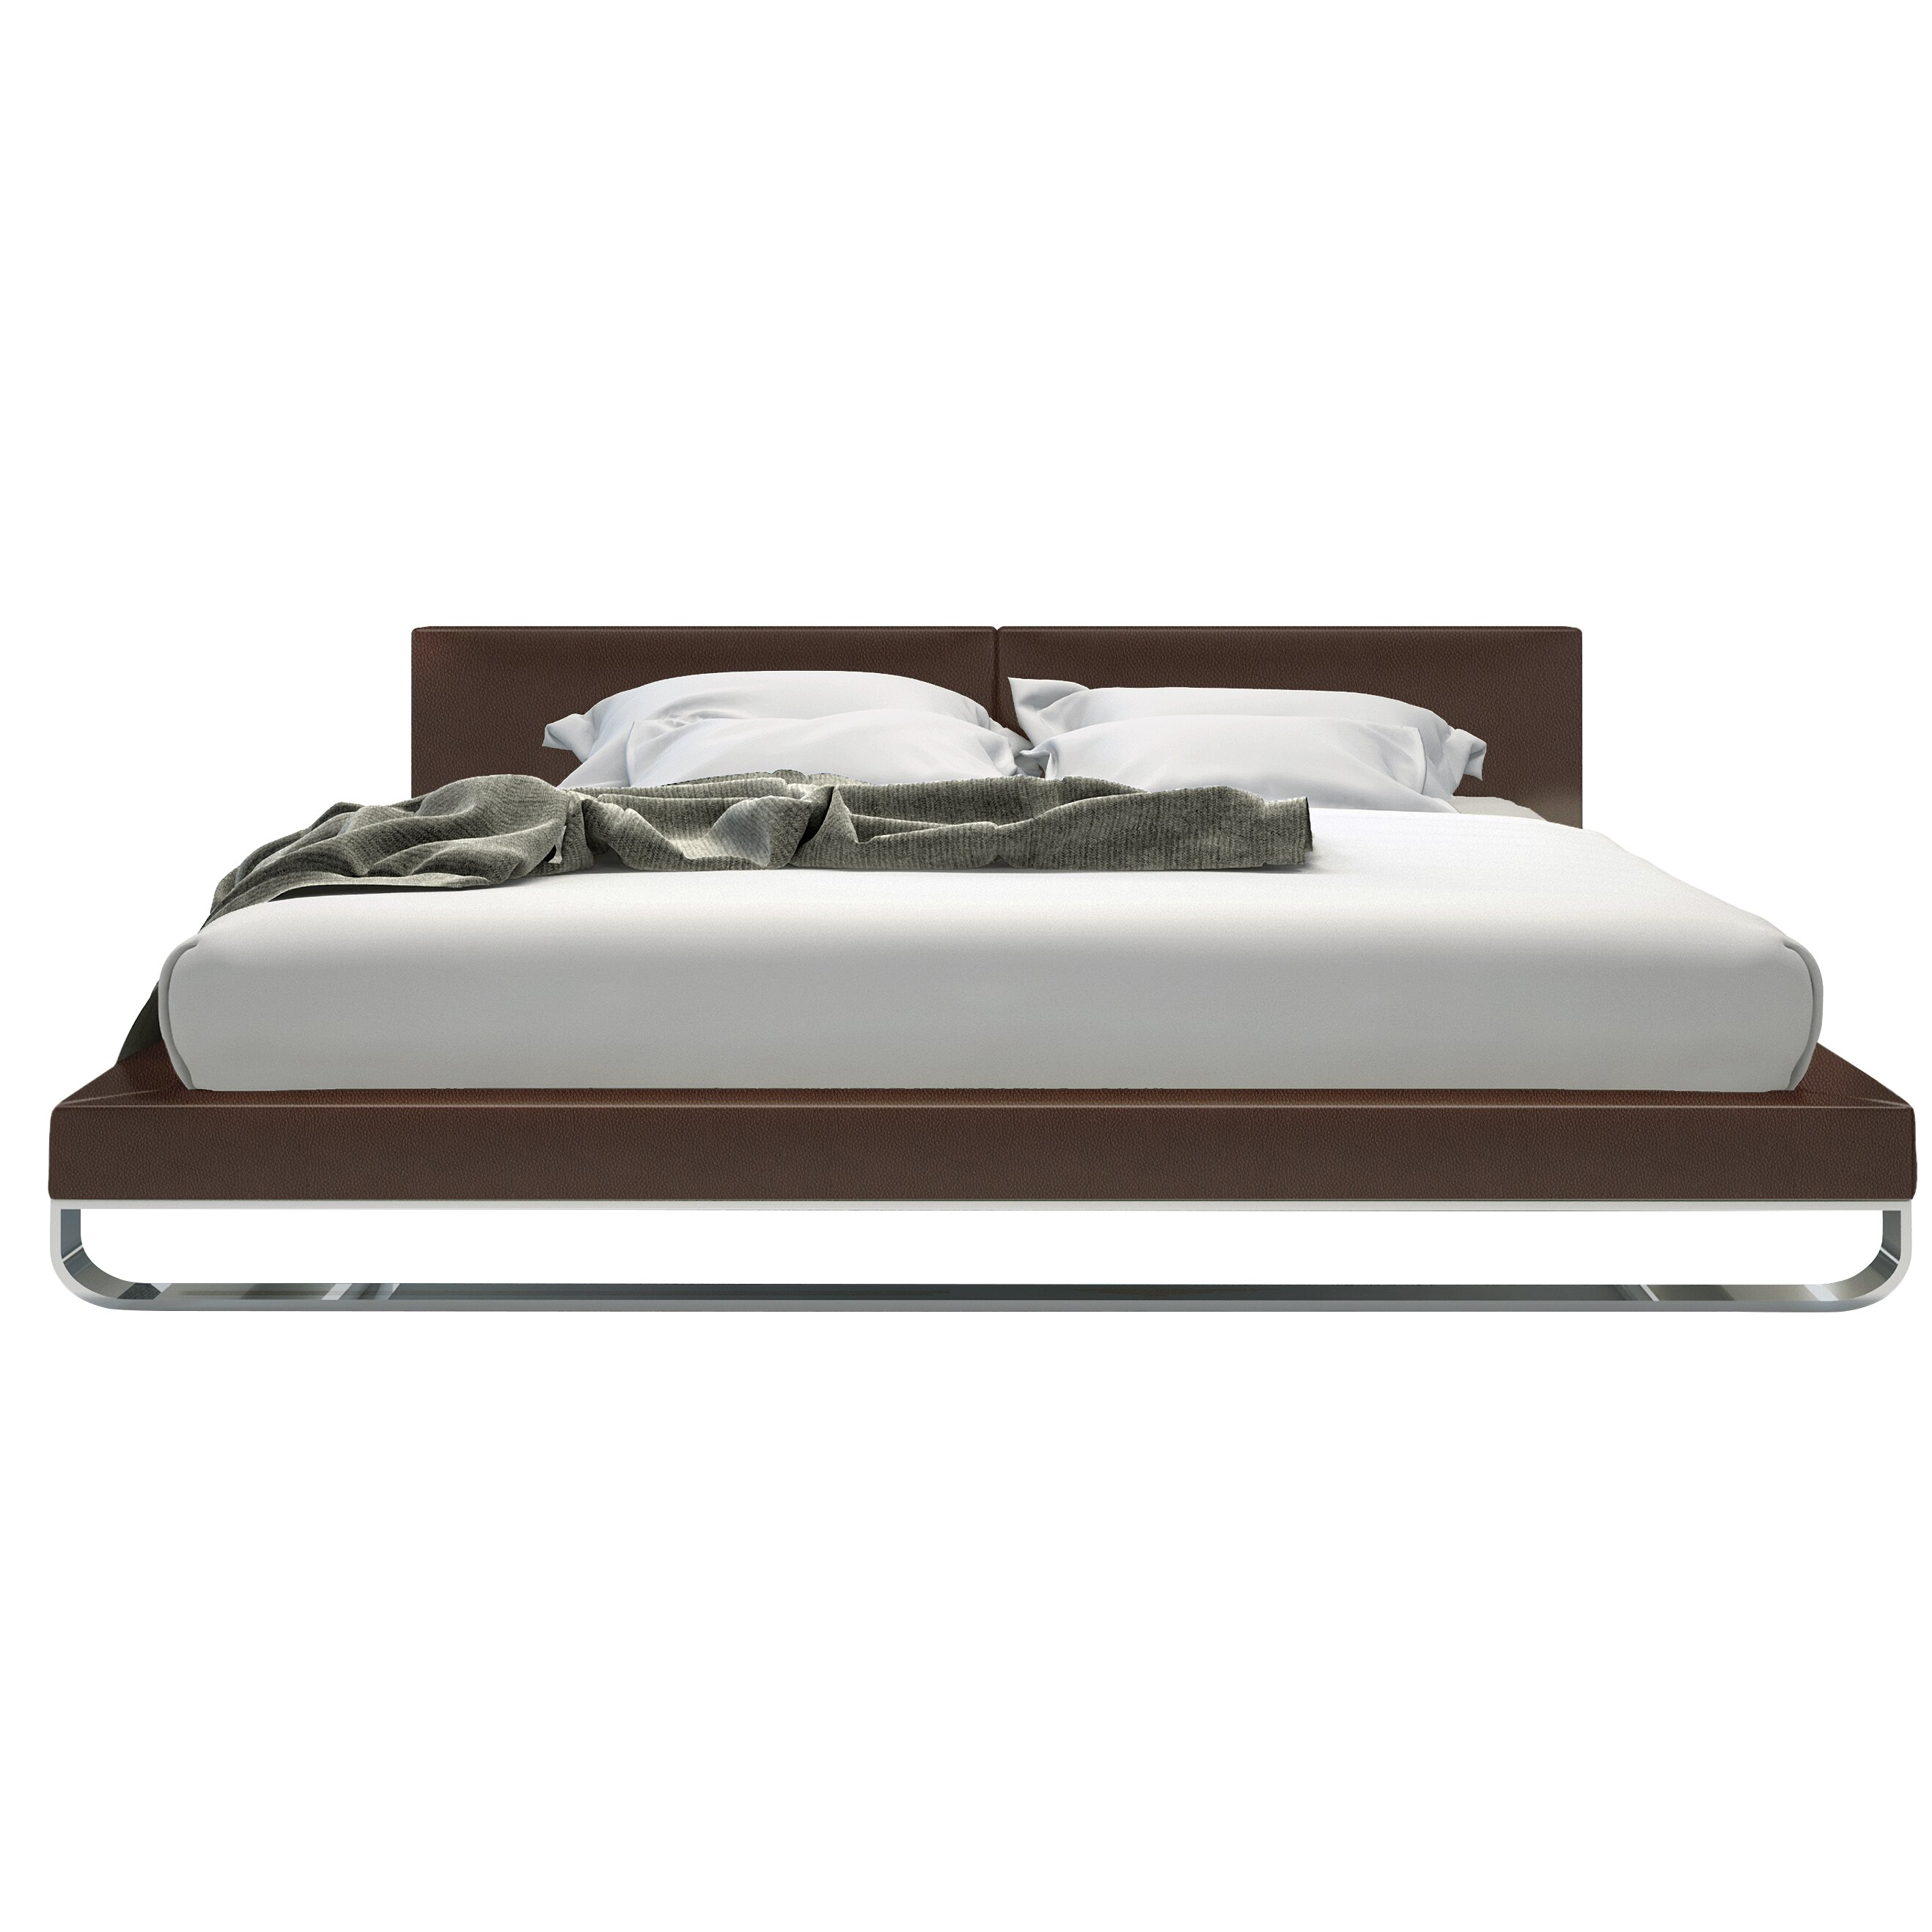 Modloft Chelsea Platform Customizable Bedroom Set. Chelsea Platform Customizable Bedroom Set   Reviews   AllModern